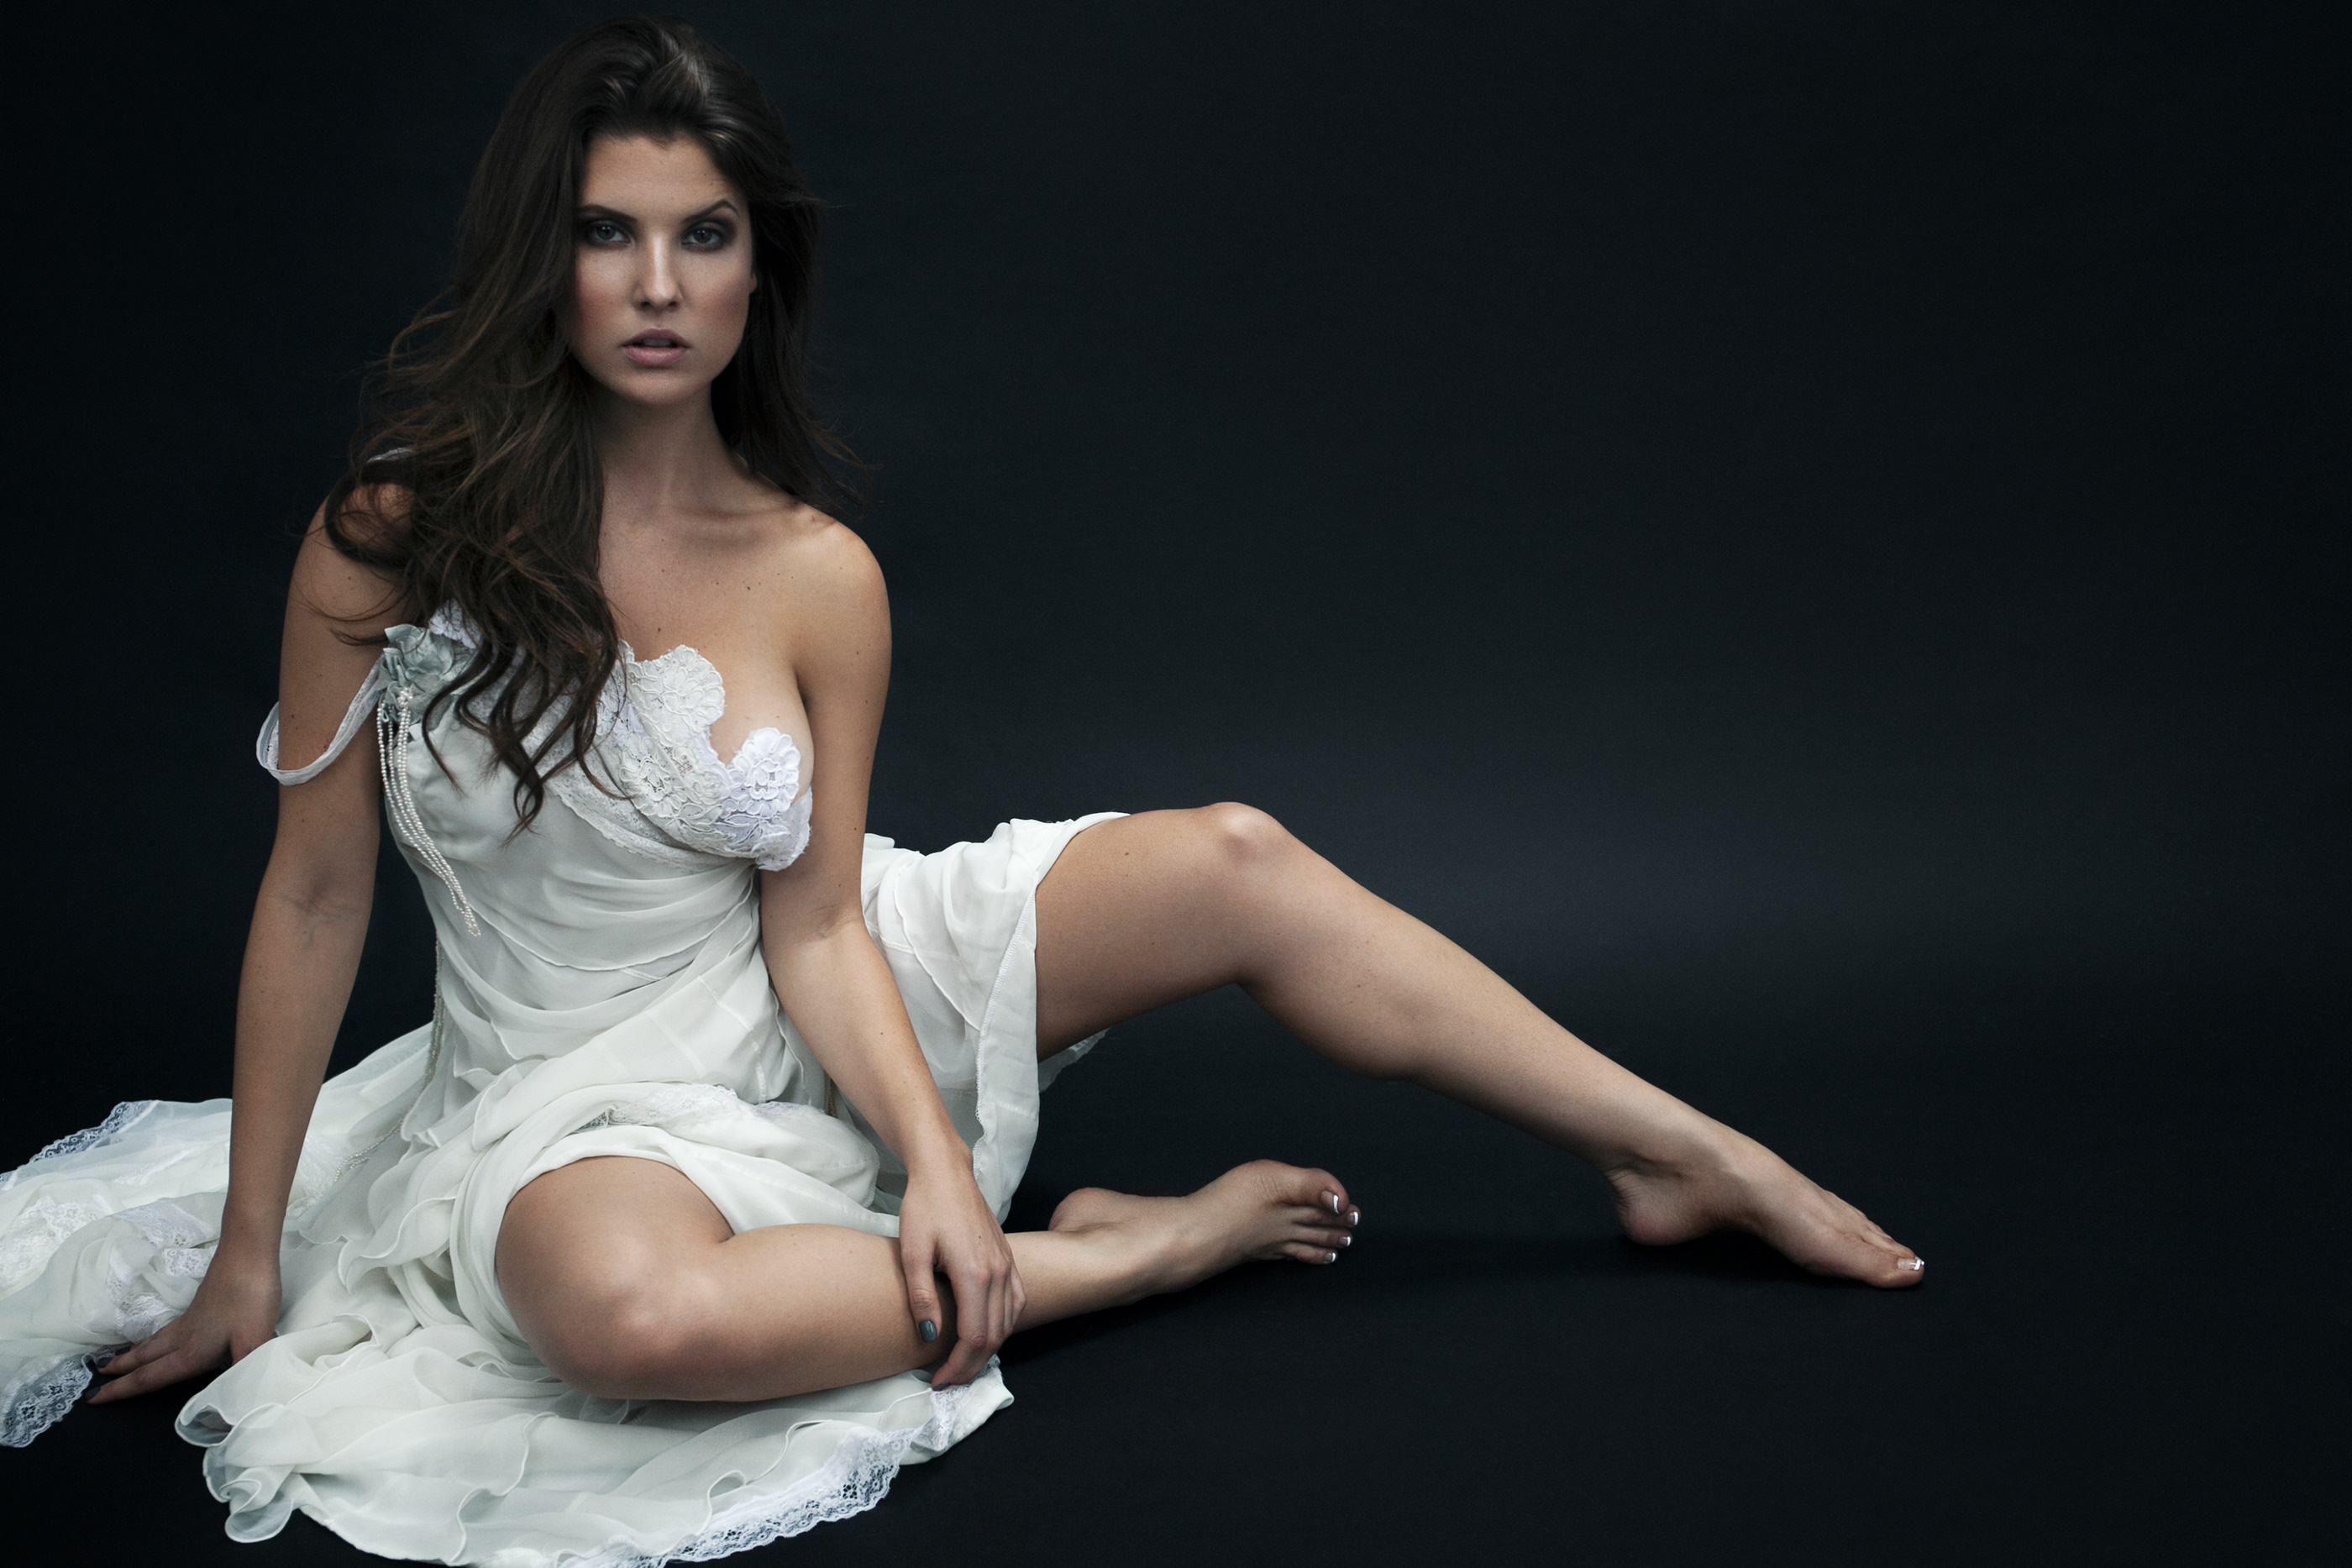 Amanda cery